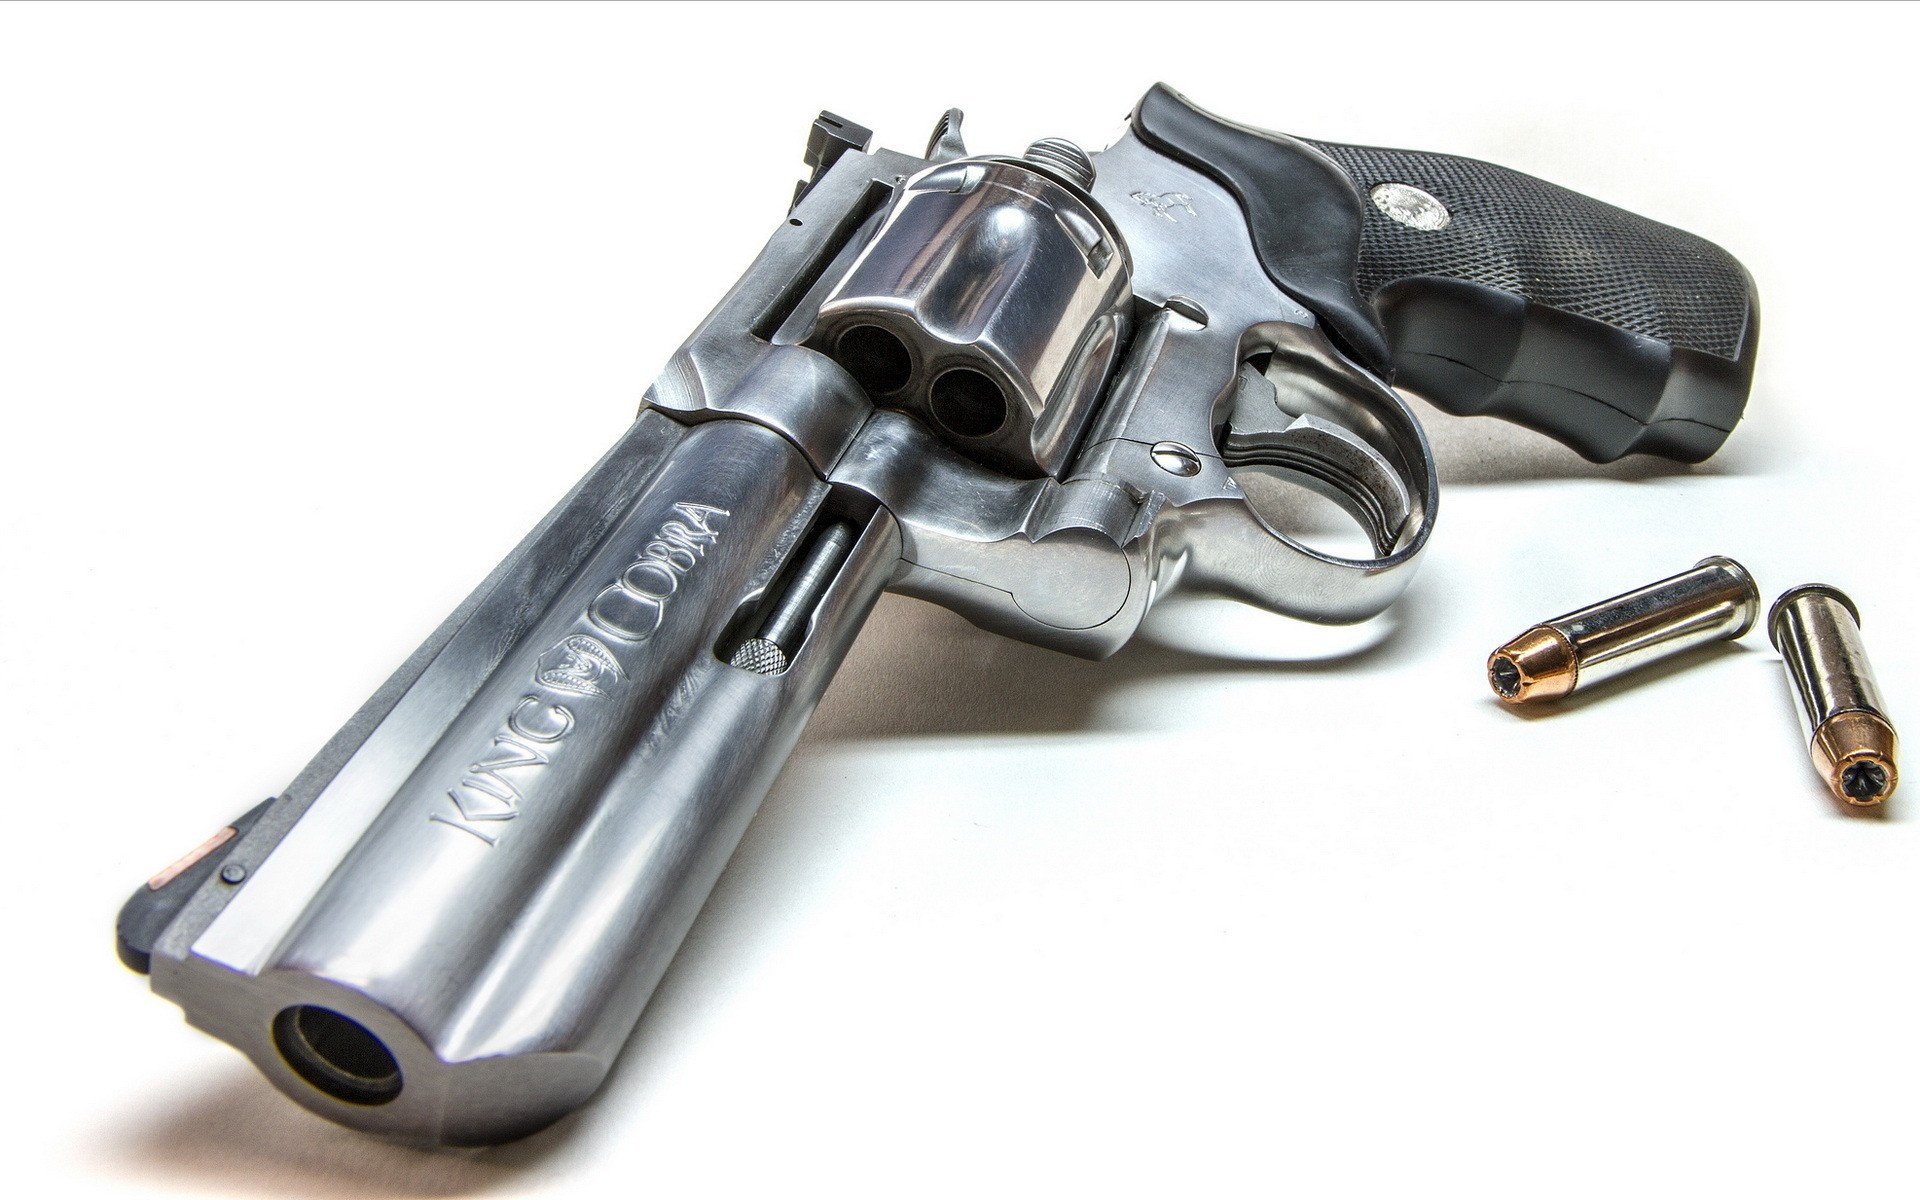 Un revolver plateado - 1920x1200